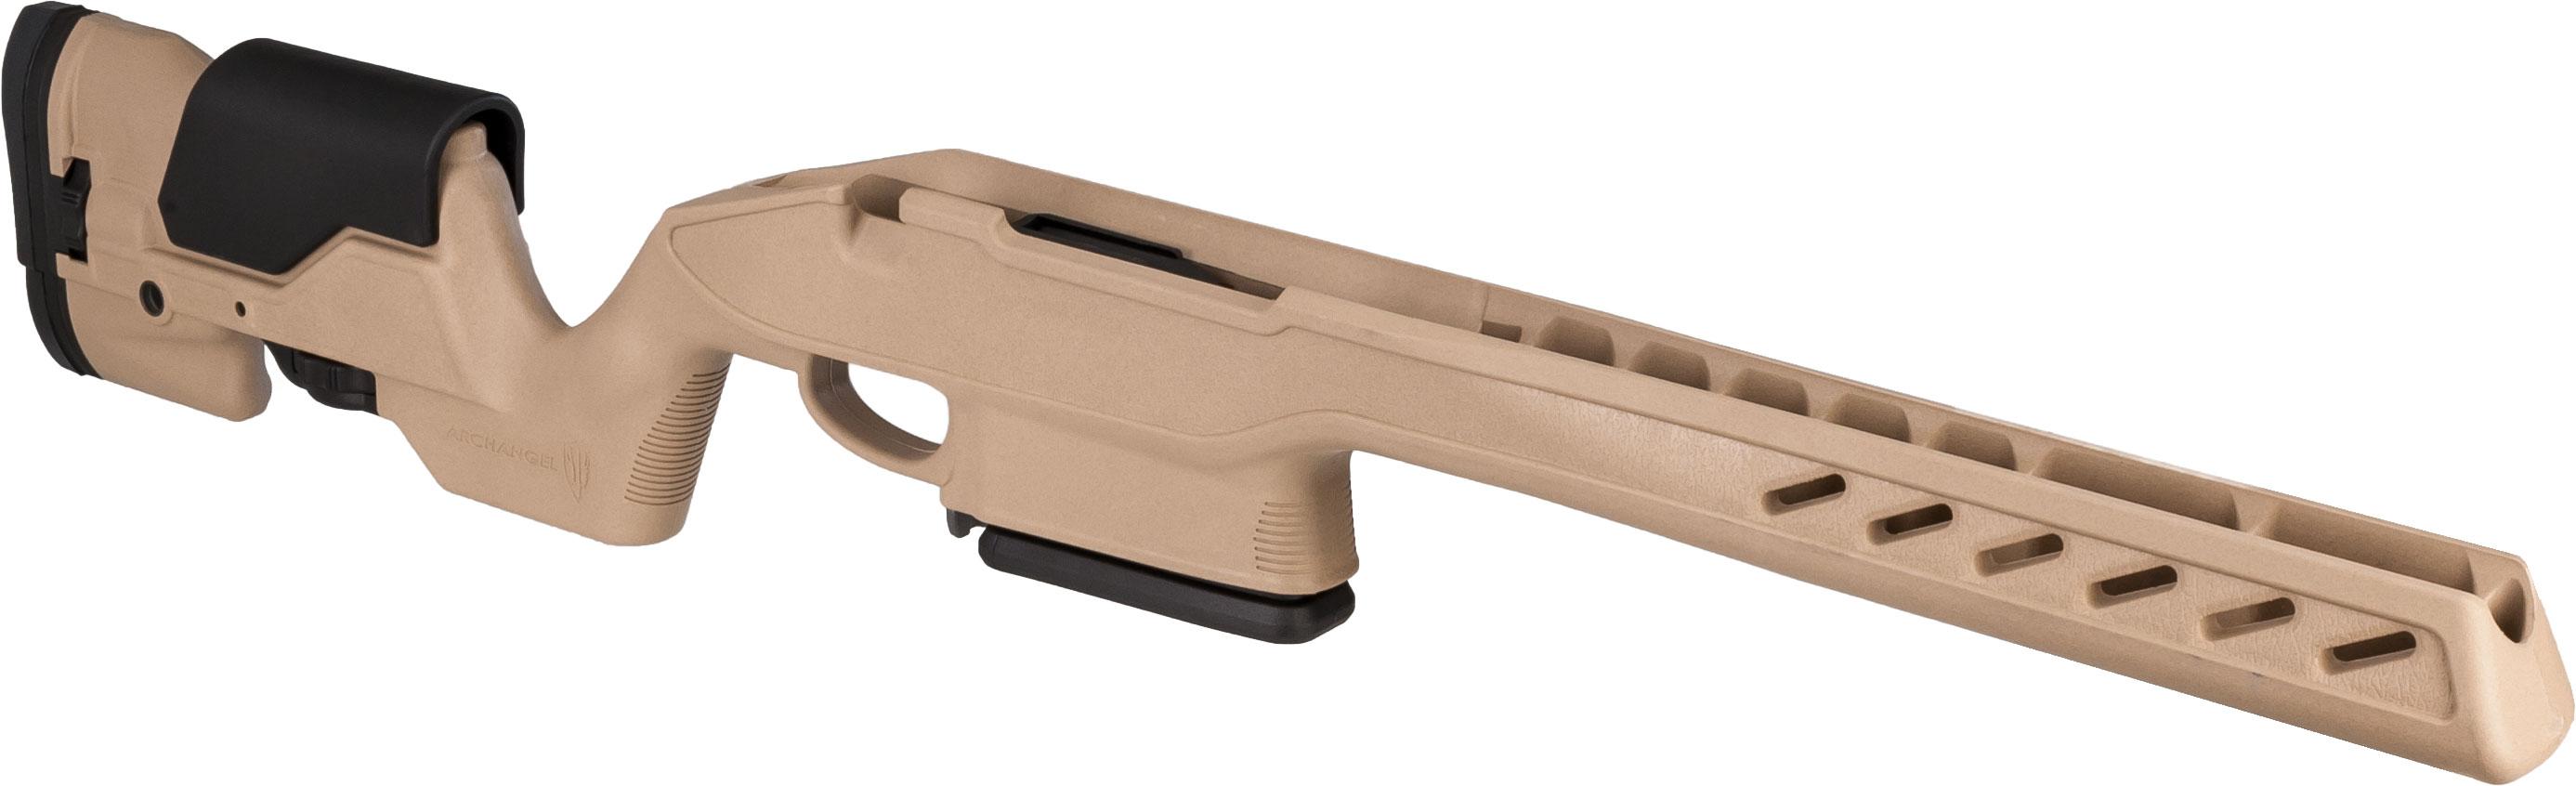 ProMag Archangel Remington Model 700 Long Action Precision Stock w/5-Round  Follower Magnum Caliber 6-Round Magazine